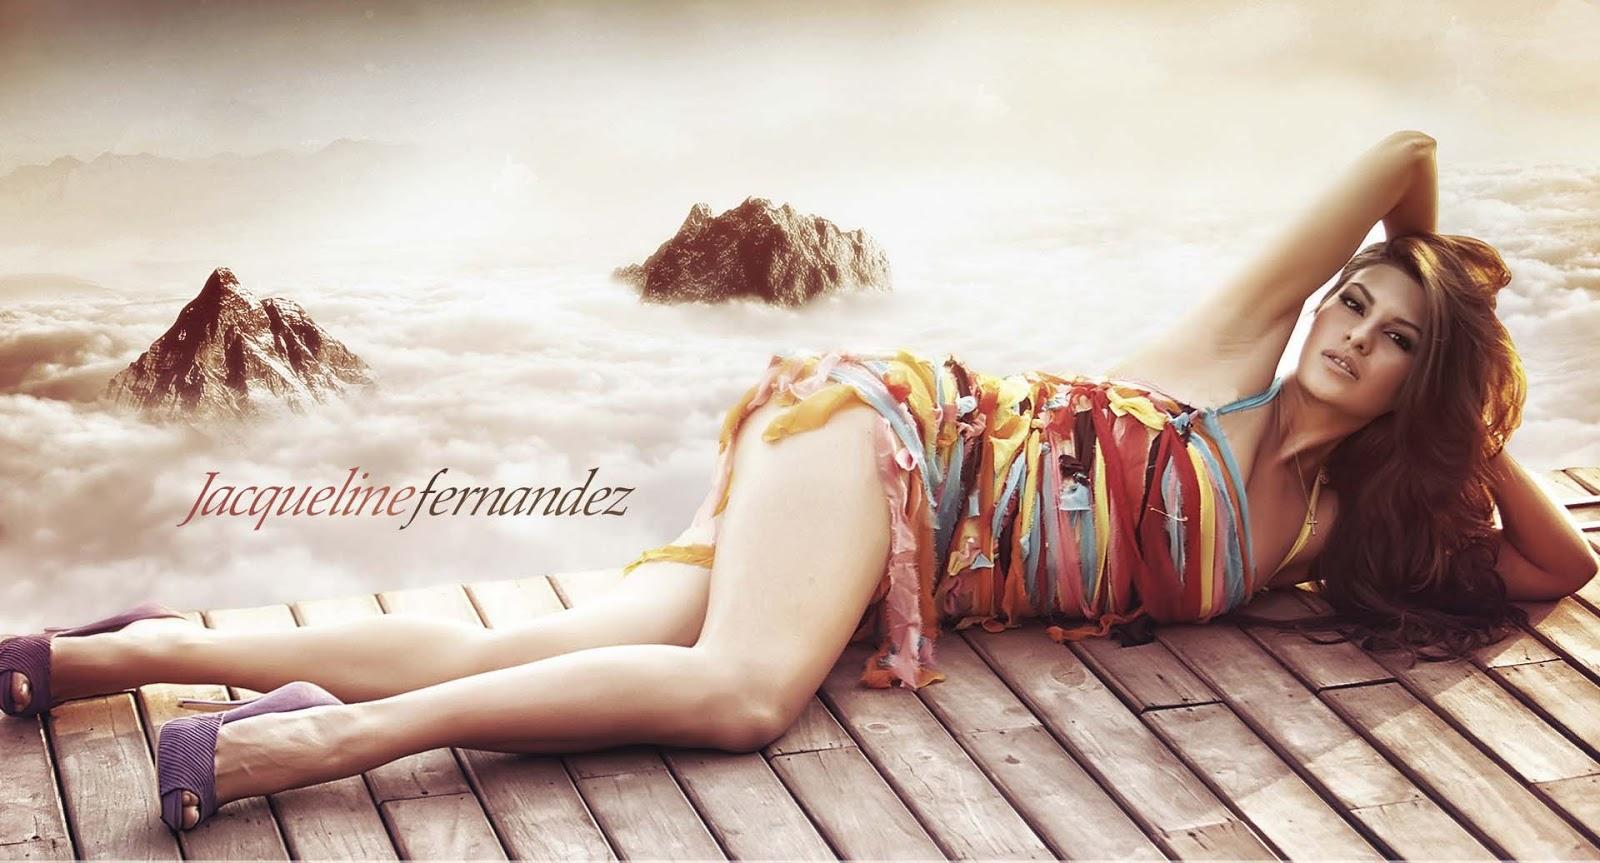 Jacqueline Fernandez HD Wallpapers Free Download